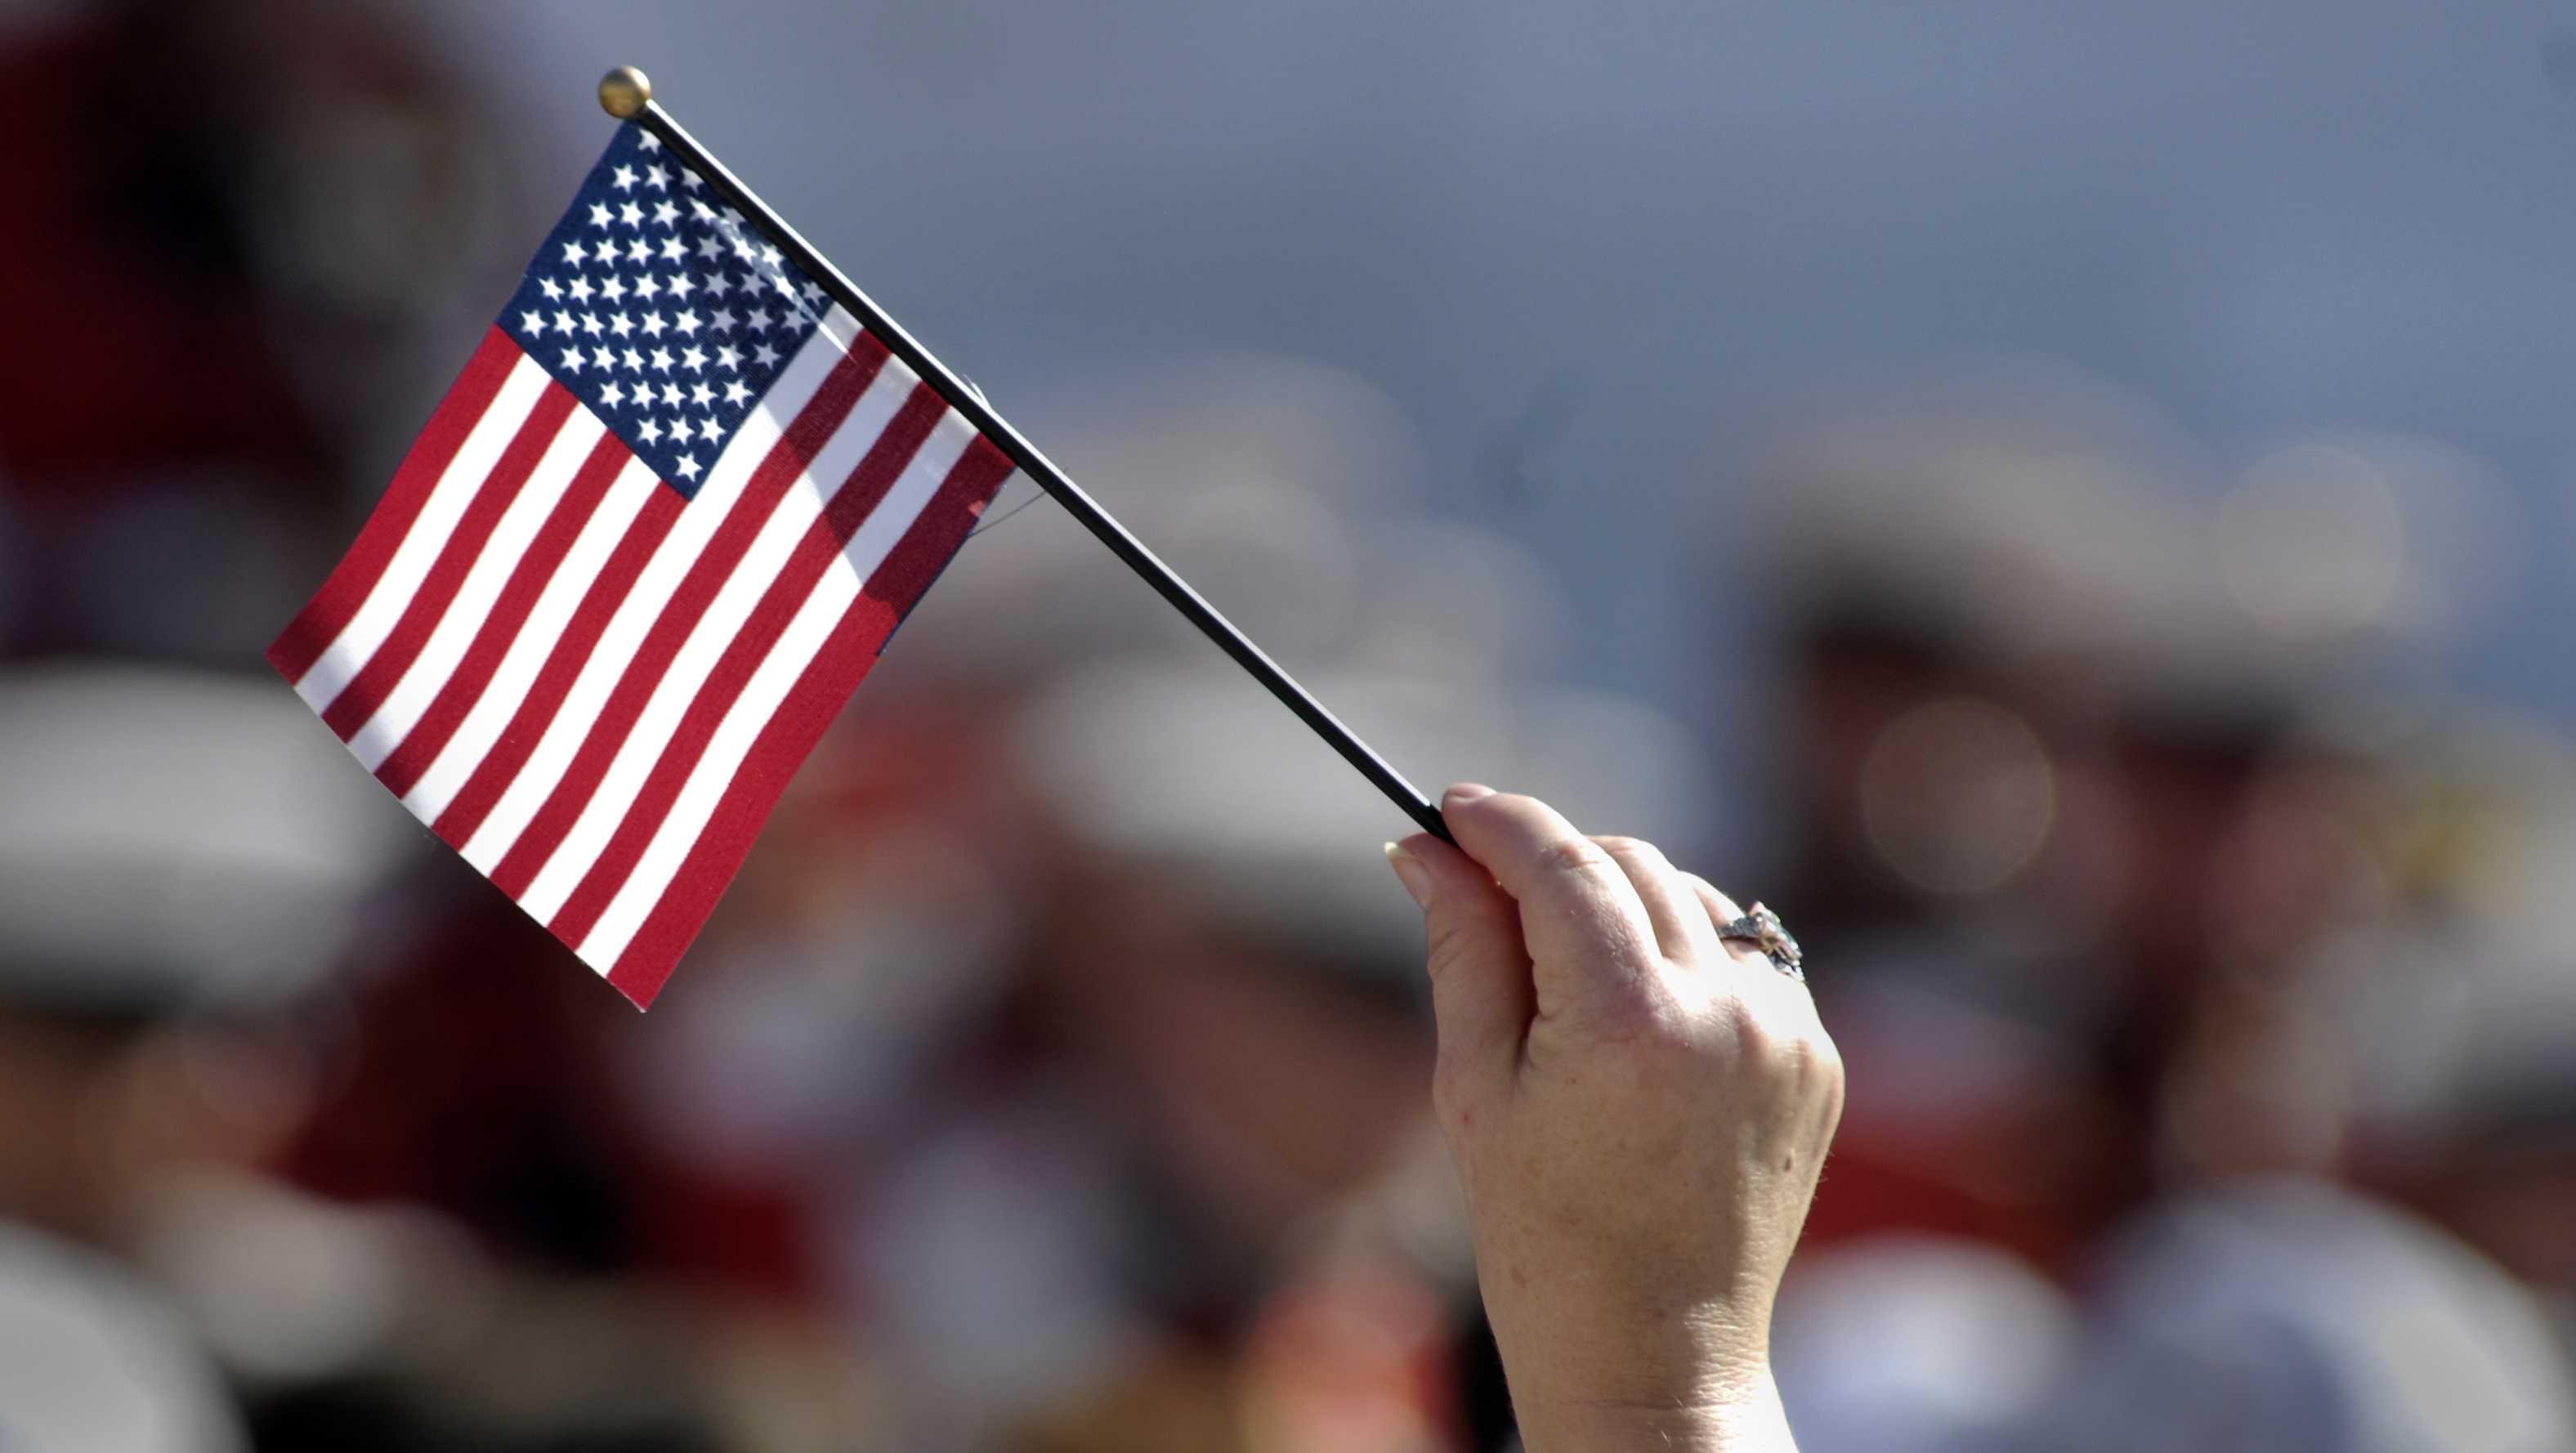 honoring veterans term papers